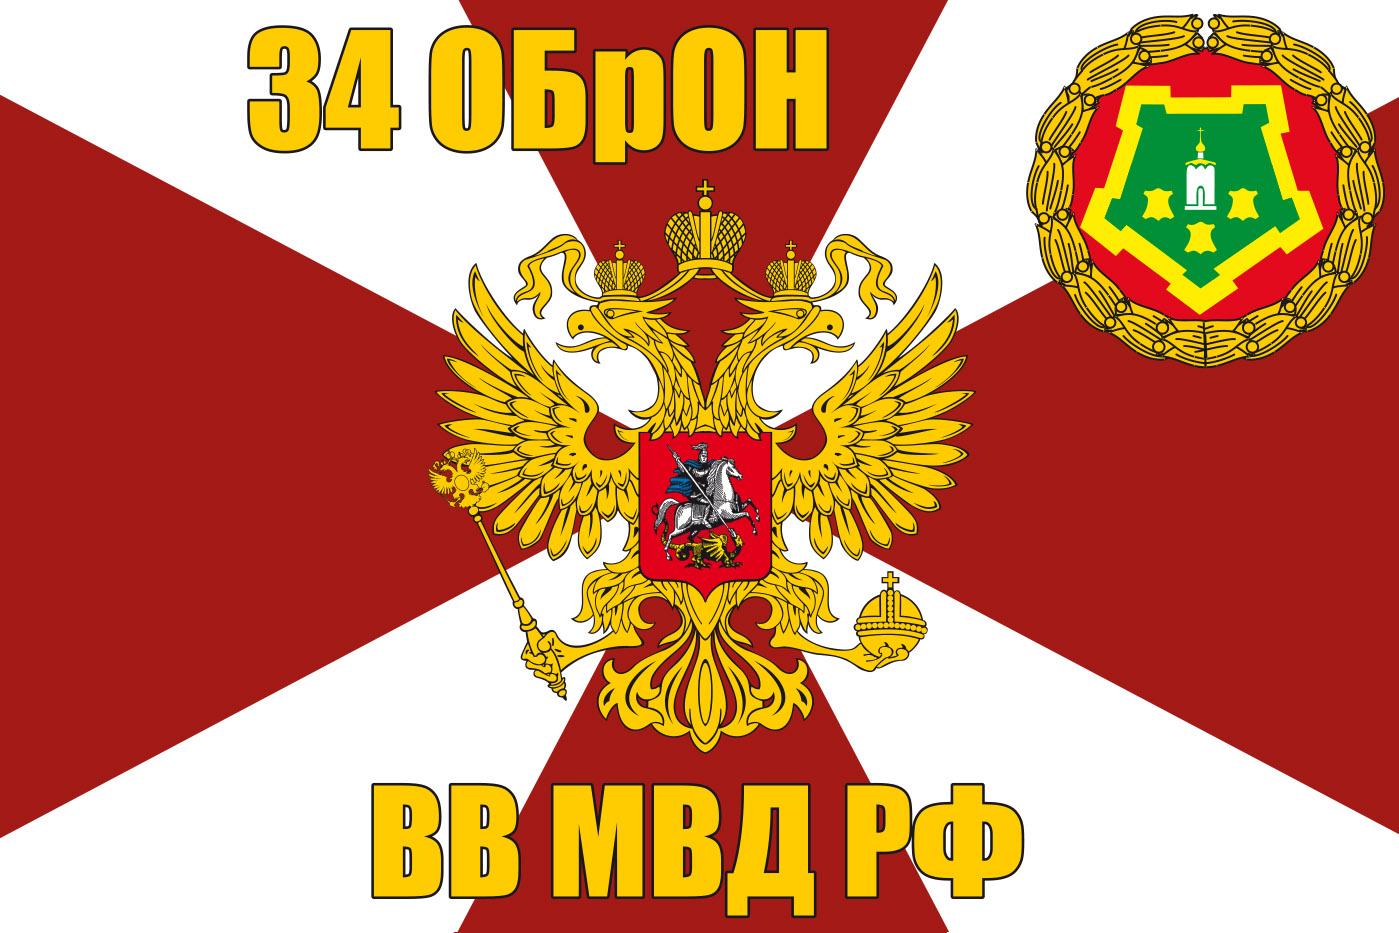 Флаг 34 ОБрОН ВВ МВД РФ